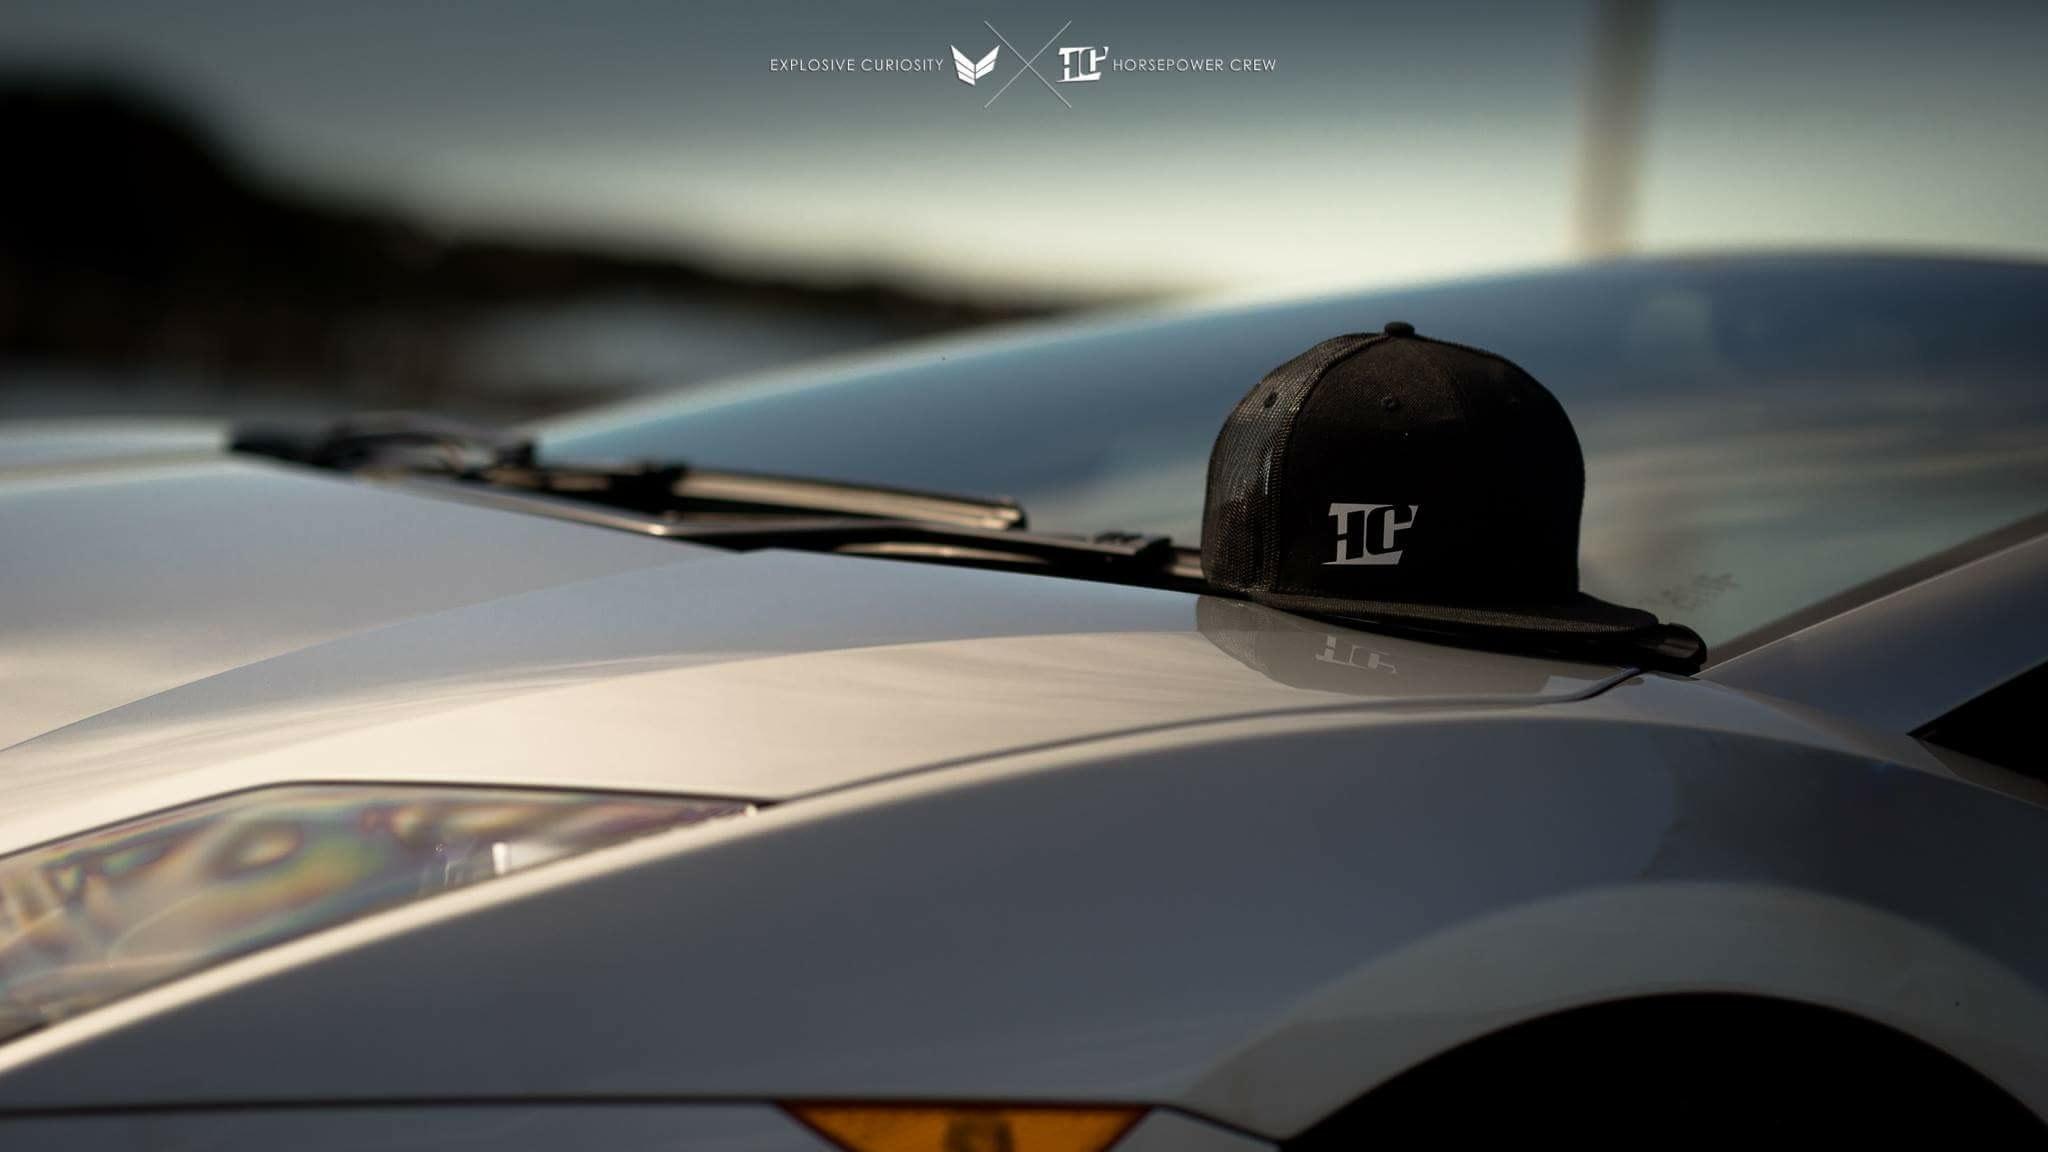 Hat-black-with-white-HC-on-lambo